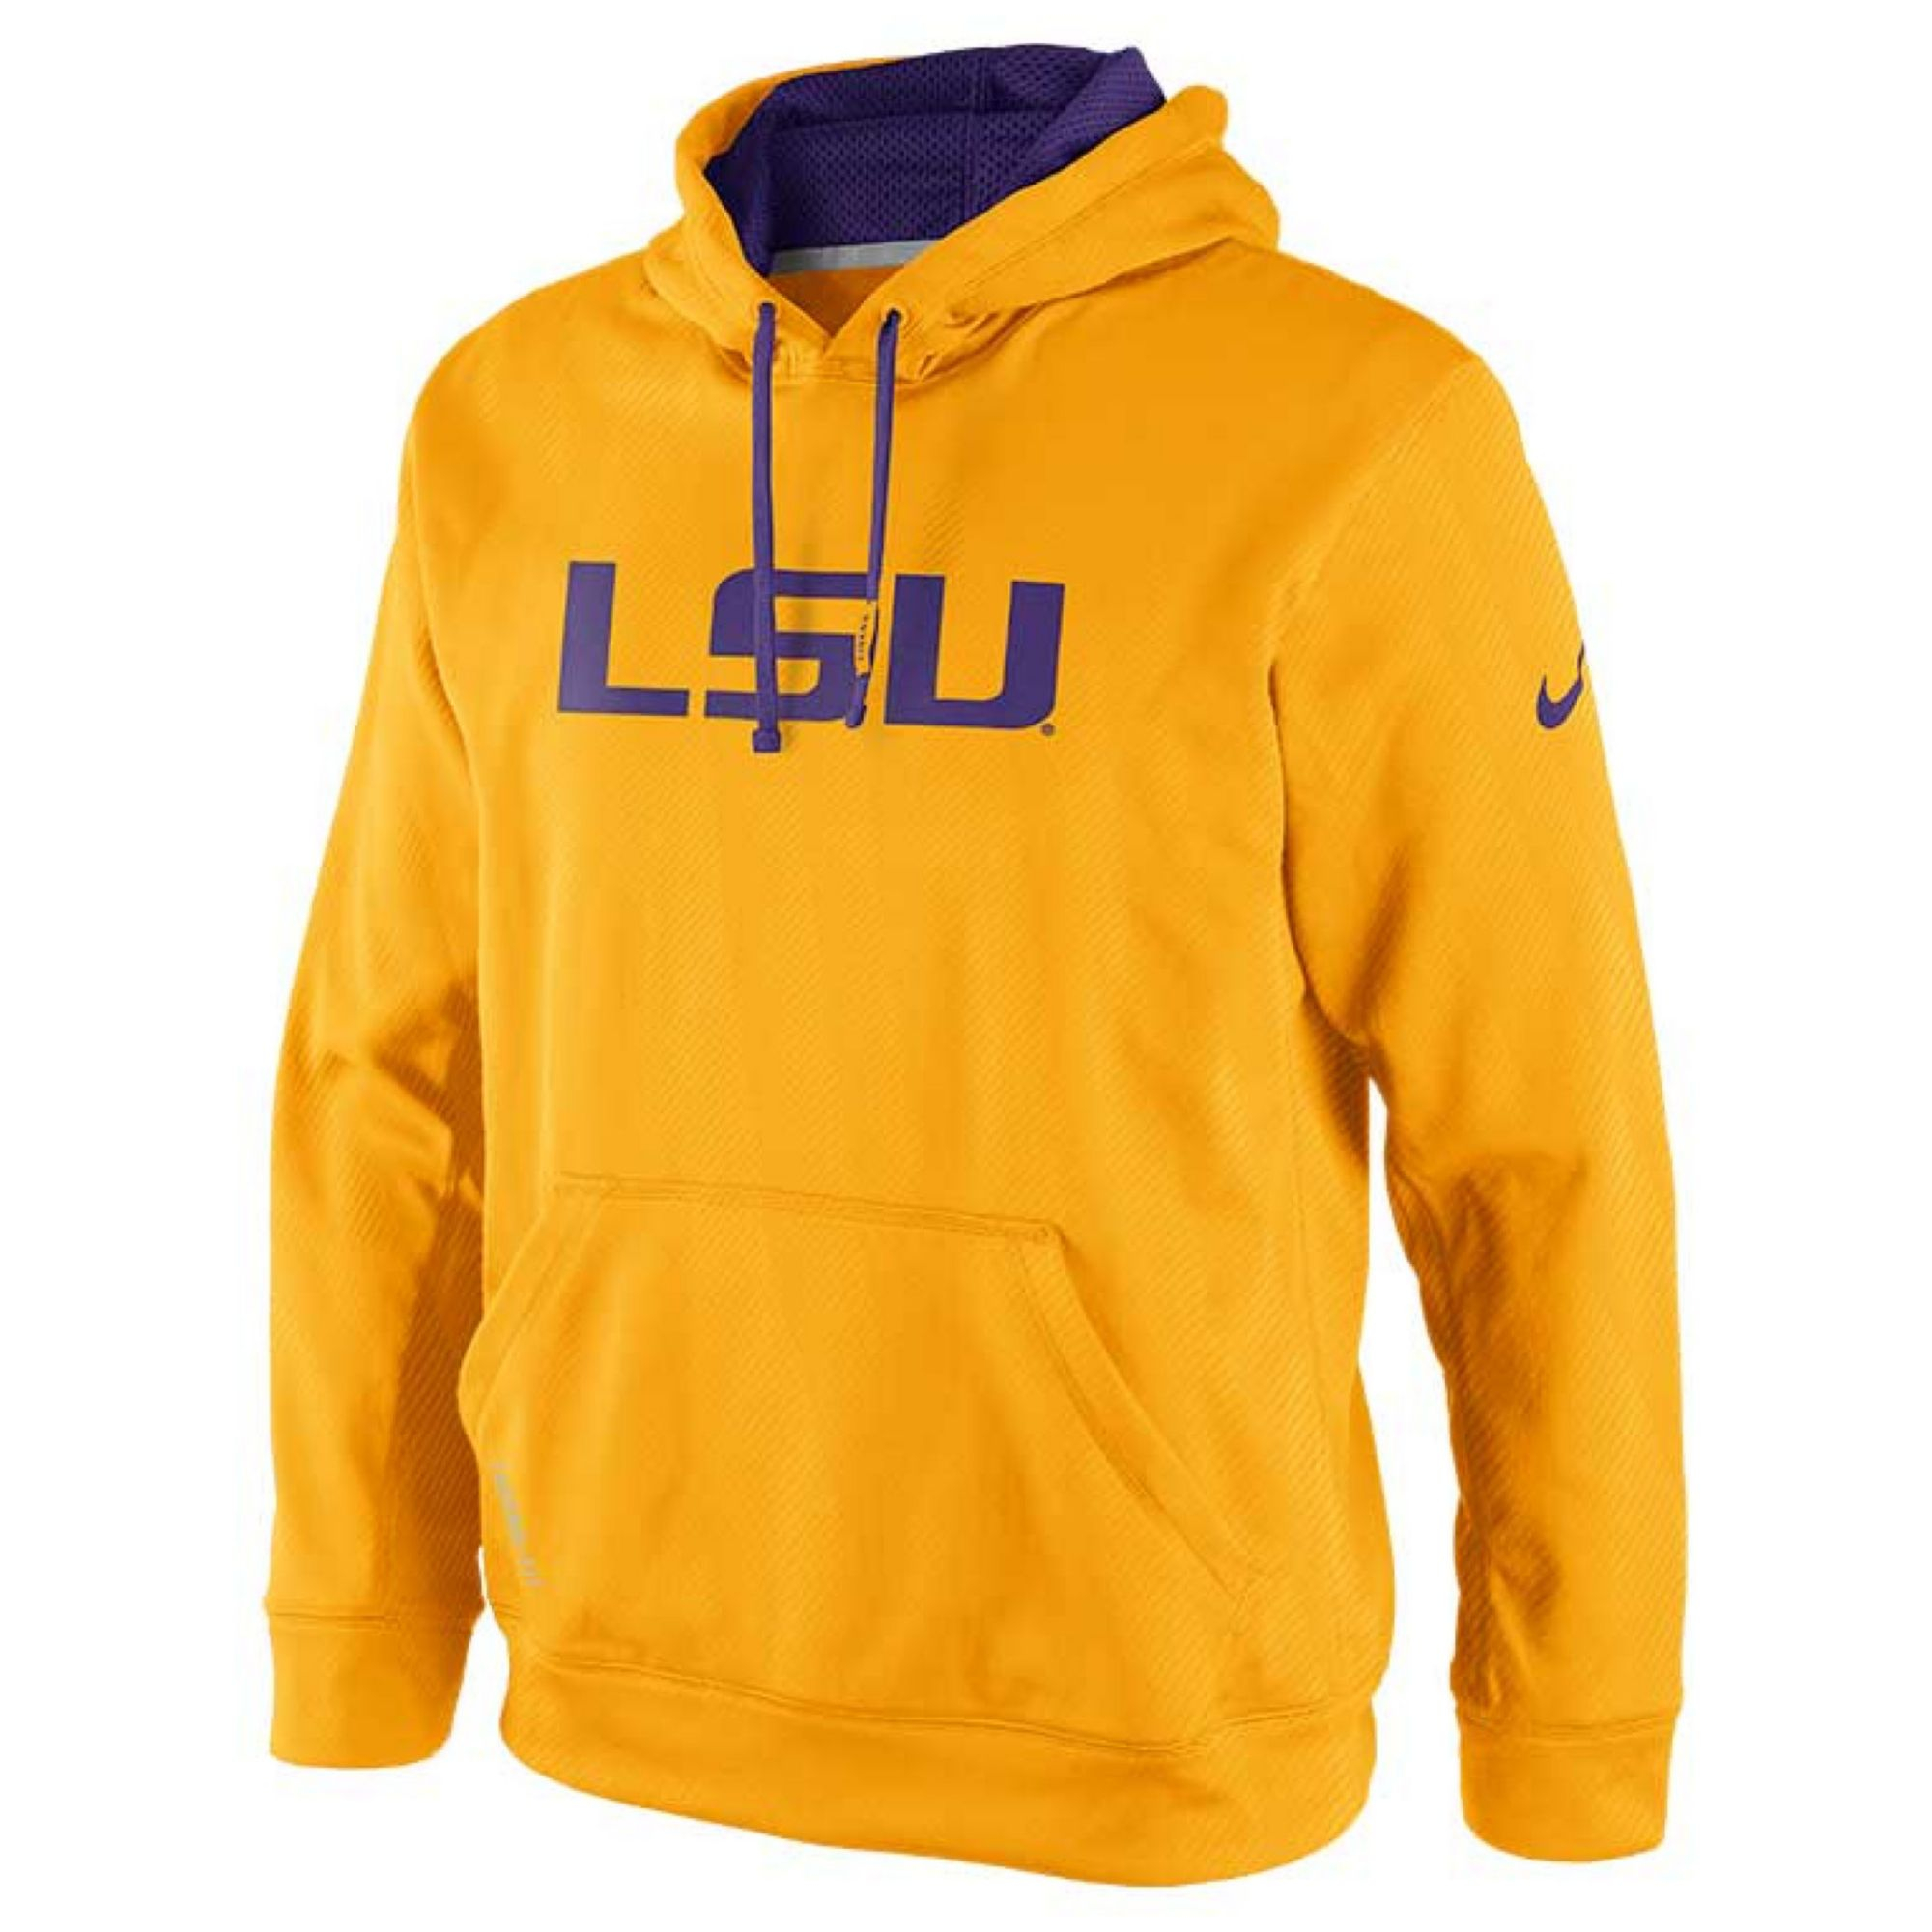 Lyst - Nike Mens Lsu Tigers Thermafit Hoodie Sweatshirt in Yellow ... 4dba313b76b1